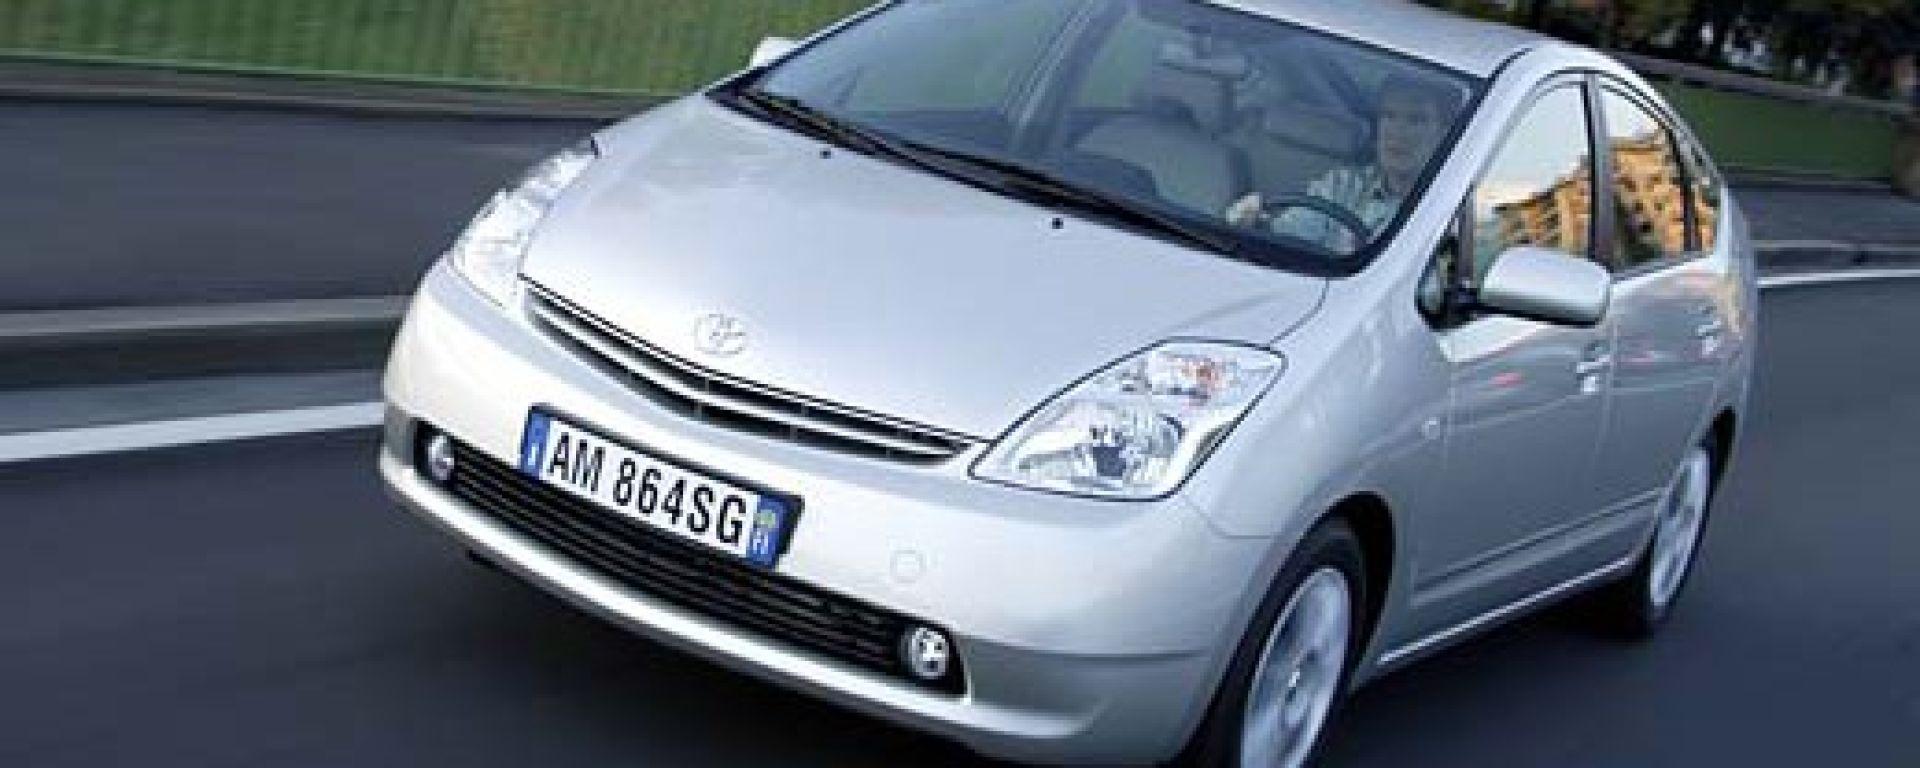 Prius, il taxi verde